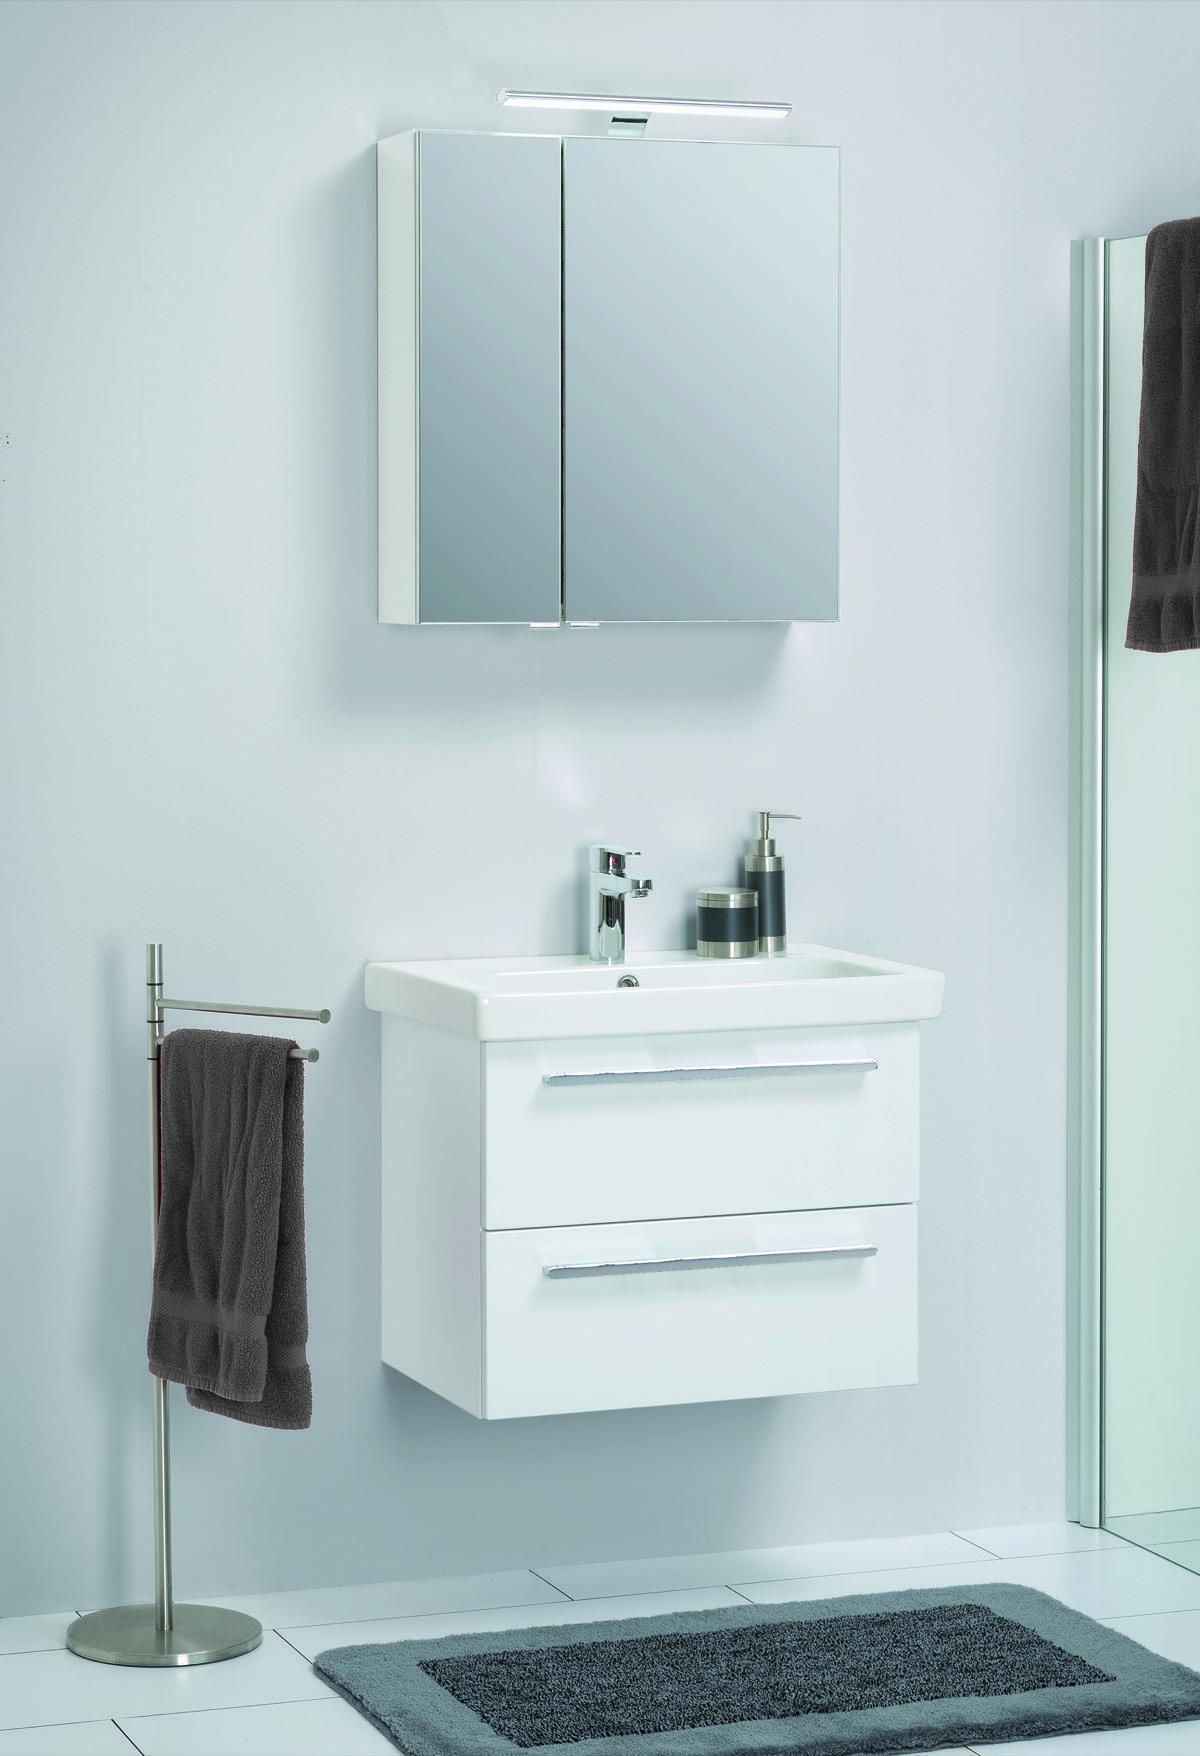 budget-badkamer-back-to-basic-mijn-bad-in-stijl-4